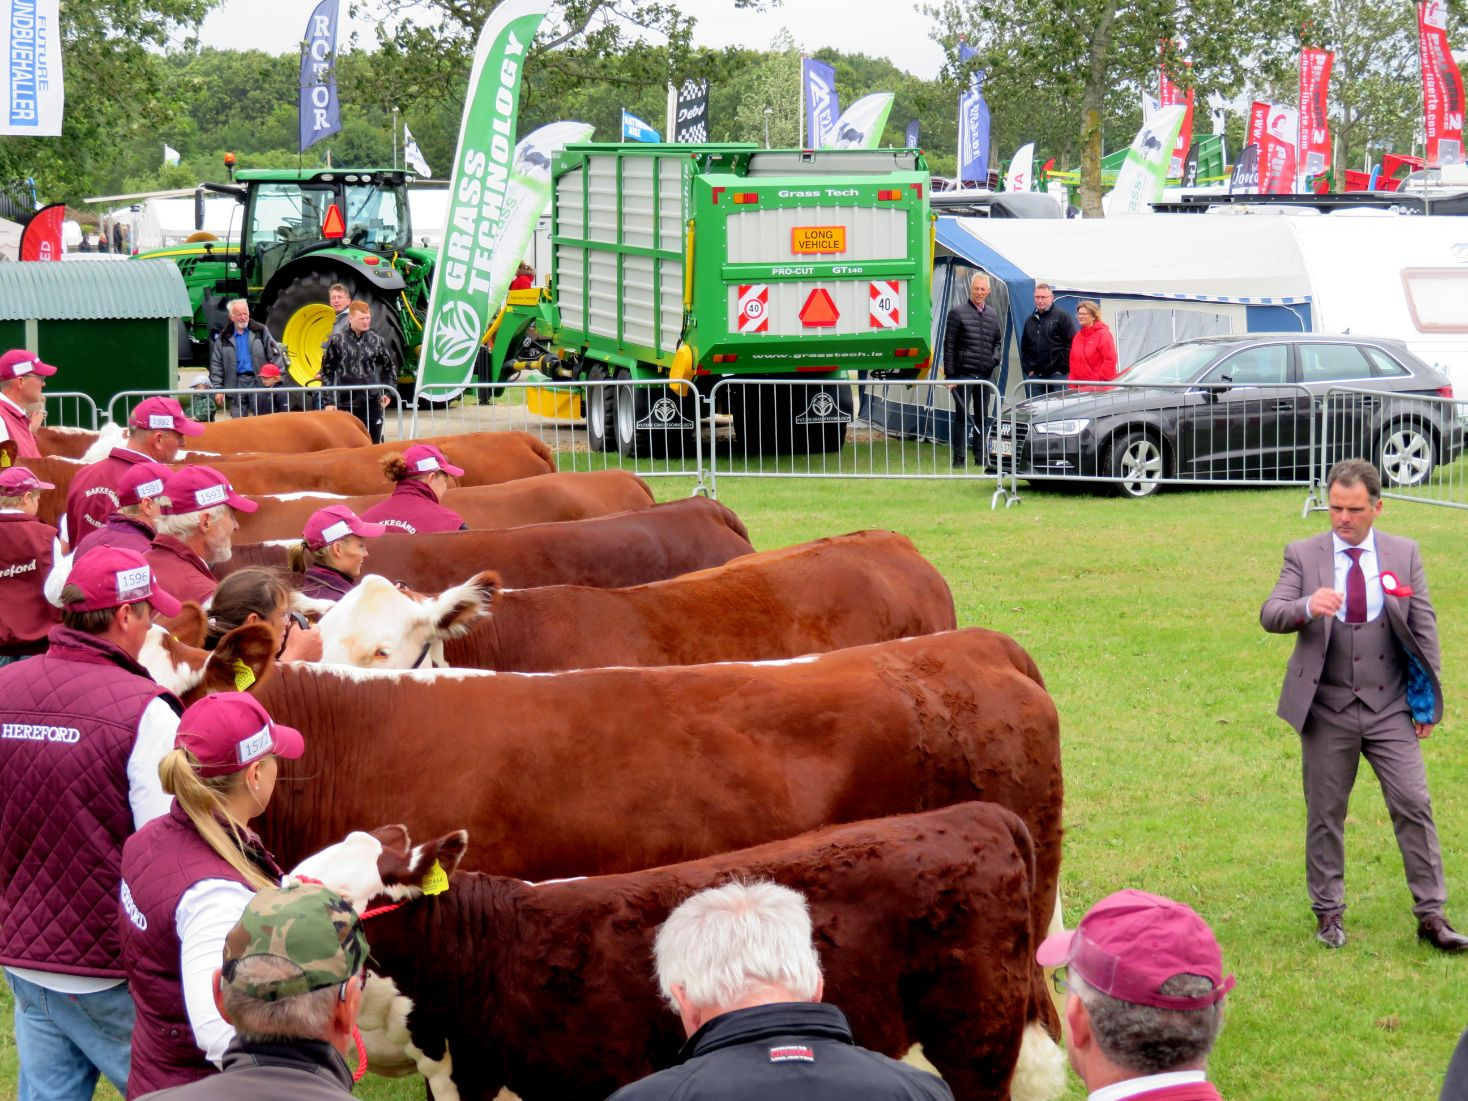 National Hereford Show Denmark, Hereford, Hereford cattle, Matthew Goulding